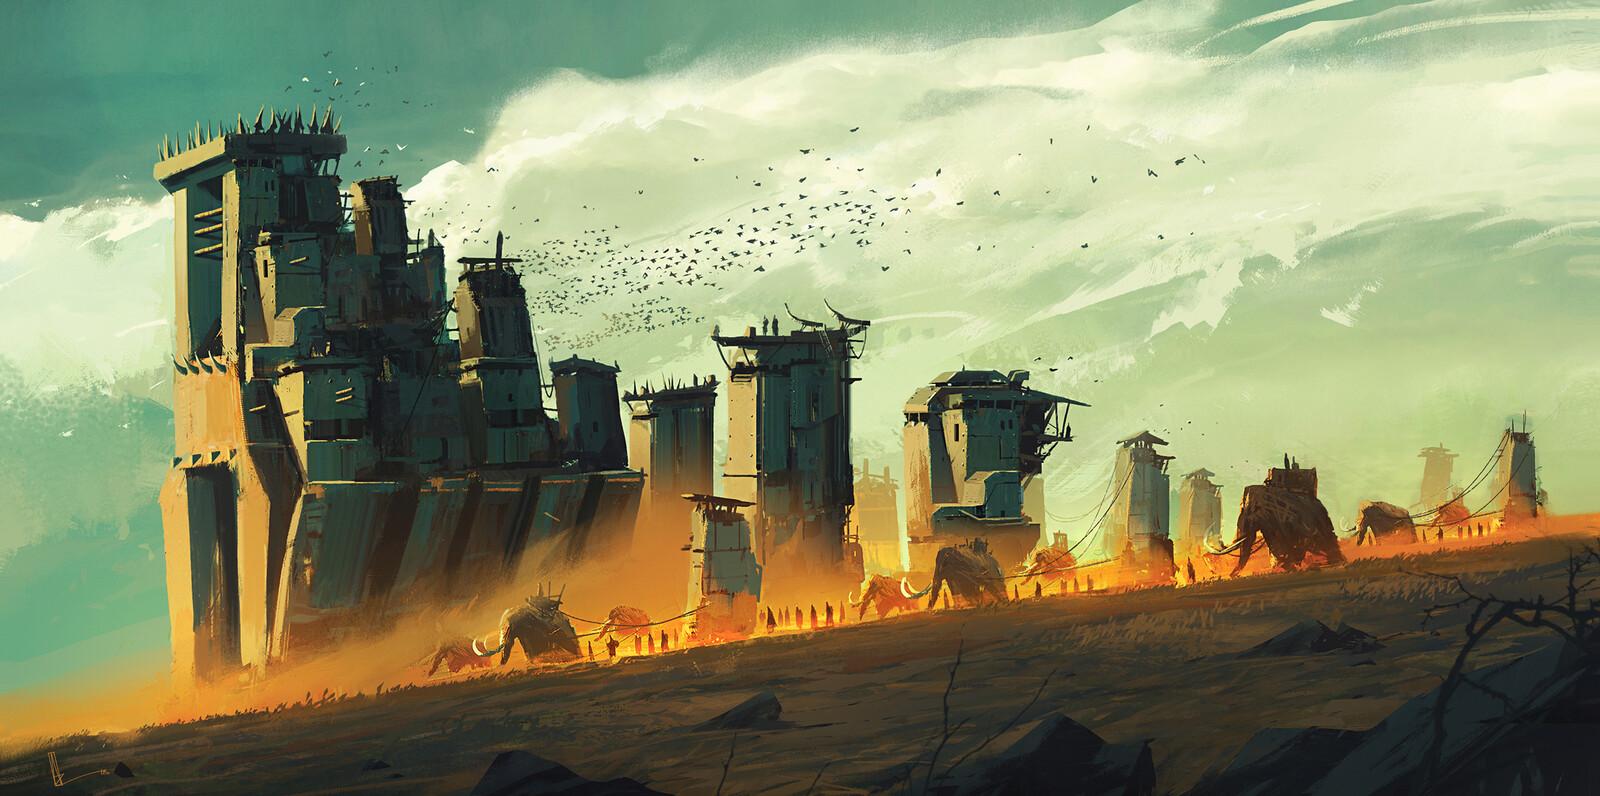 Mortal Engines / Kometsvansen